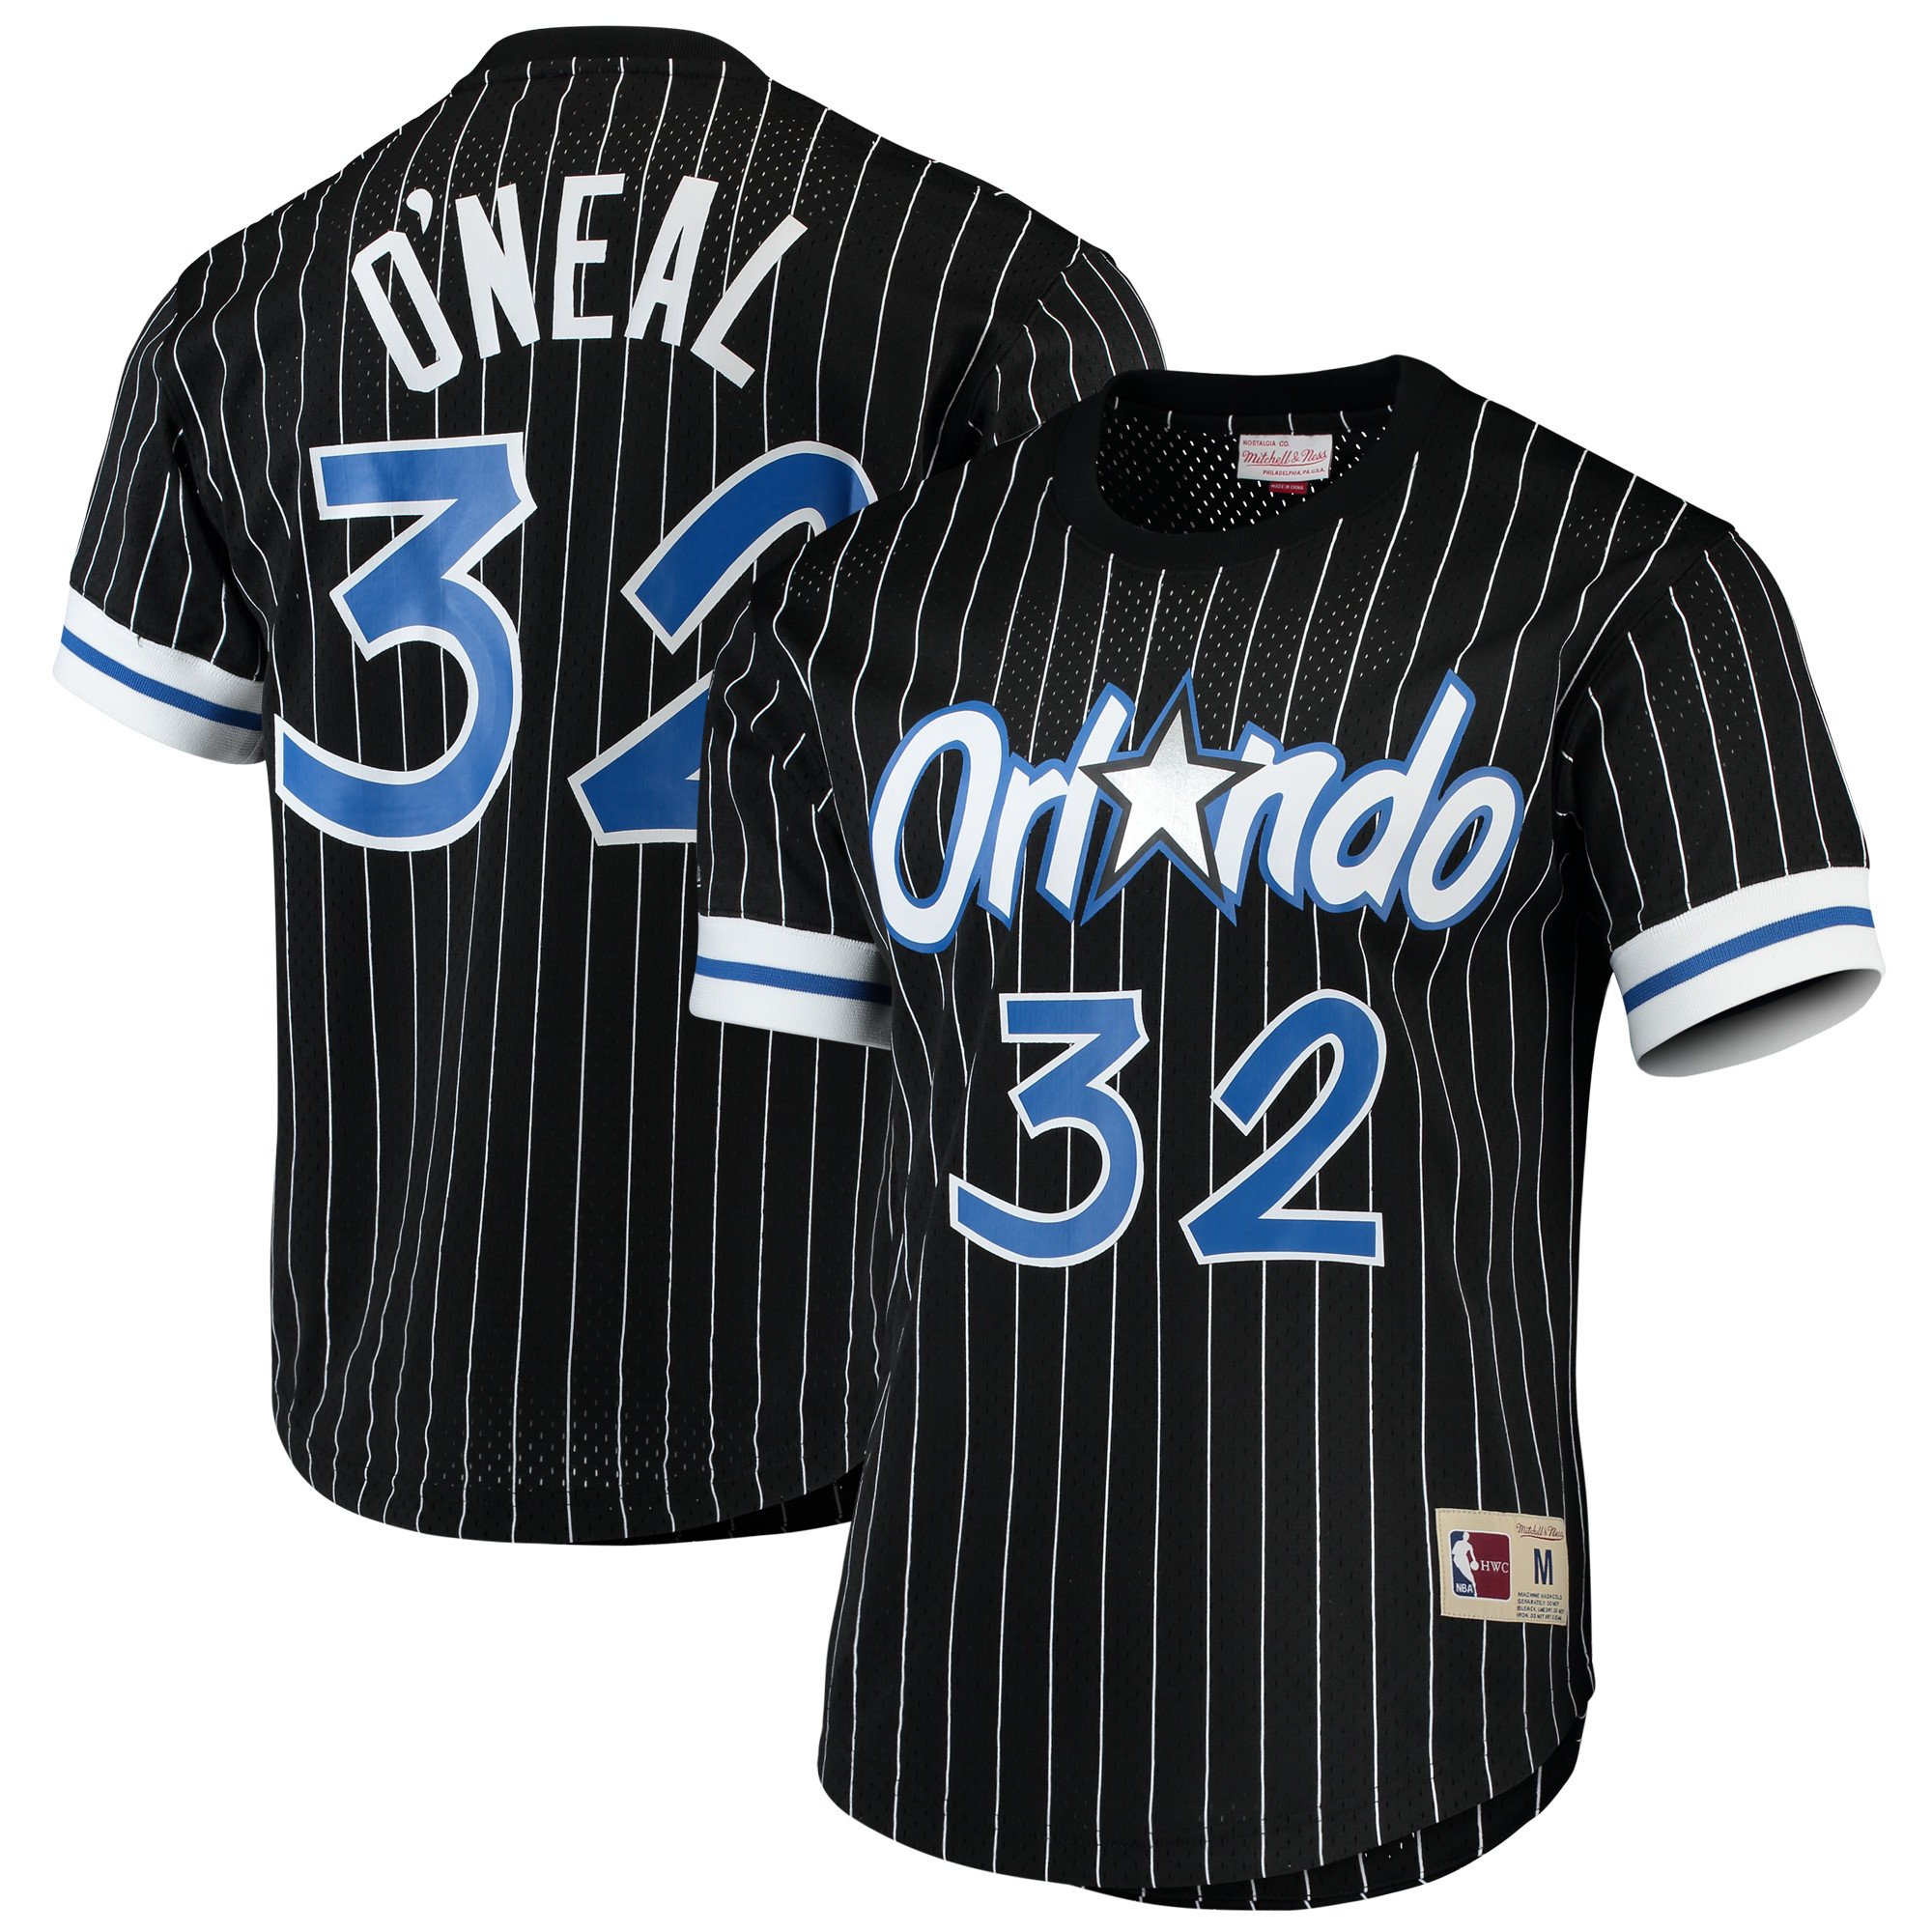 Shaquille O'Neal Orlando Magic Mitchell & Ness Hardwood Classics Mesh Crew Name & Number T-Shirt - Black